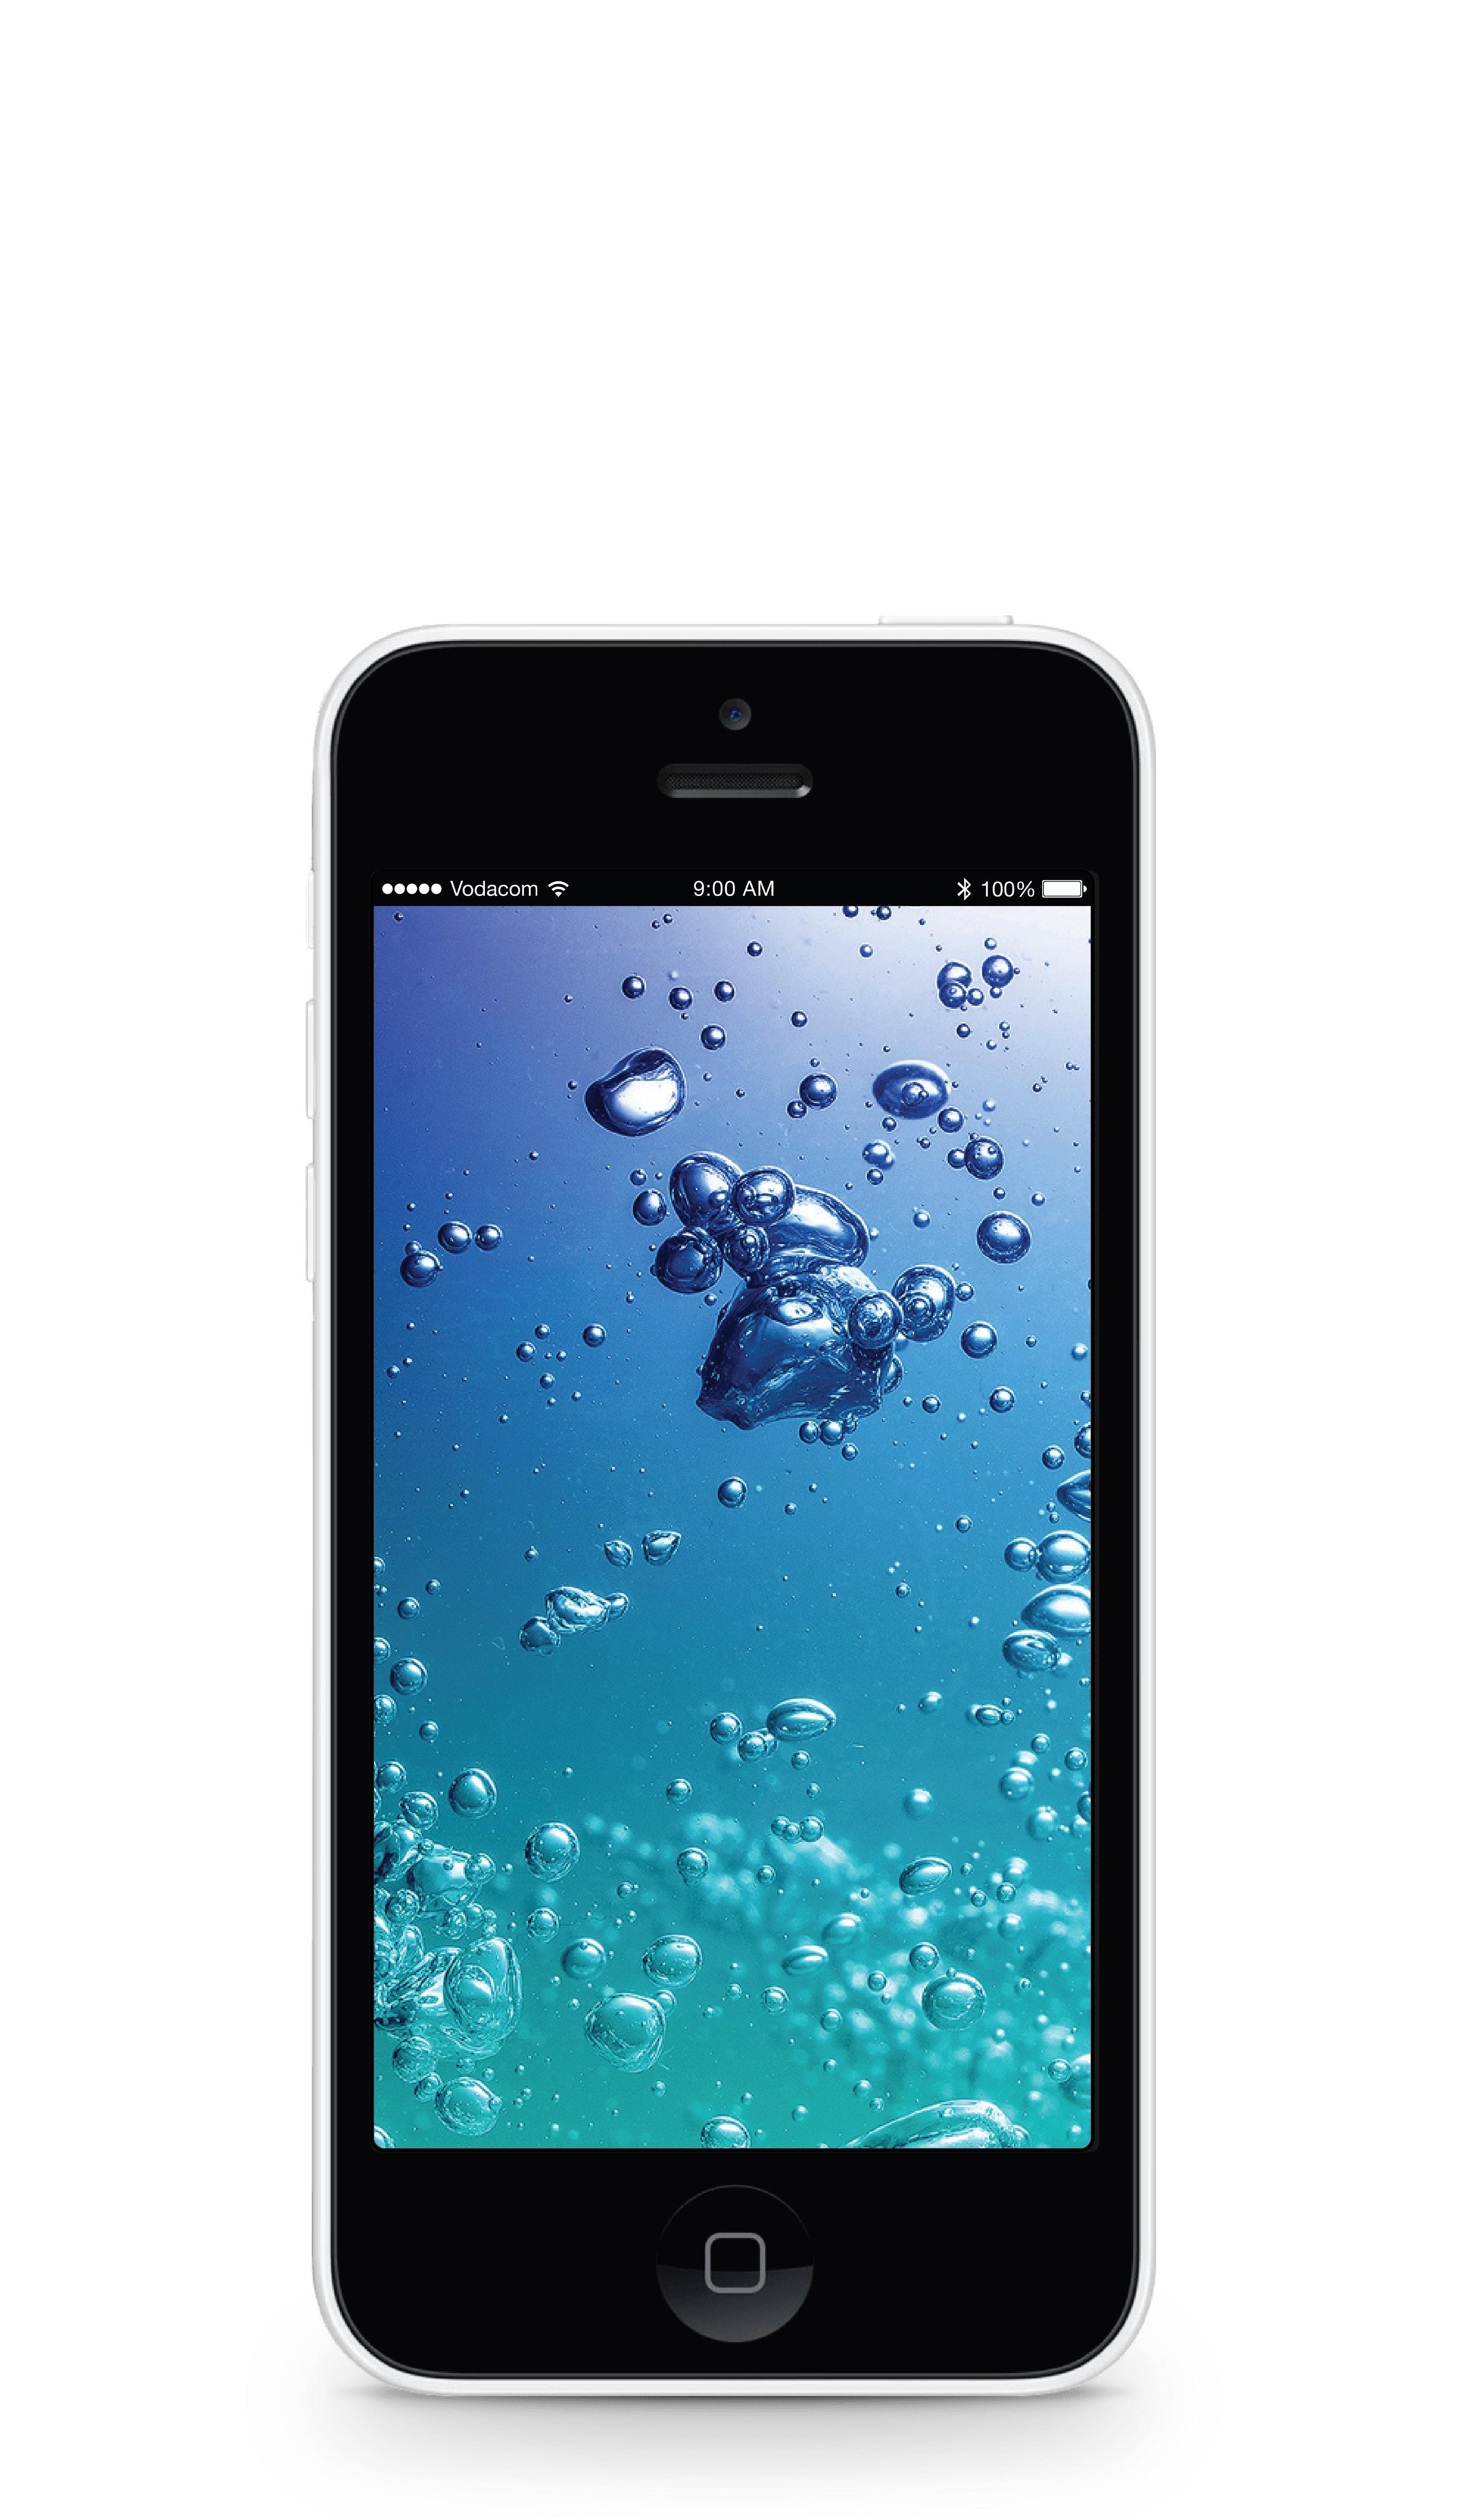 Apple iPhone 5c image